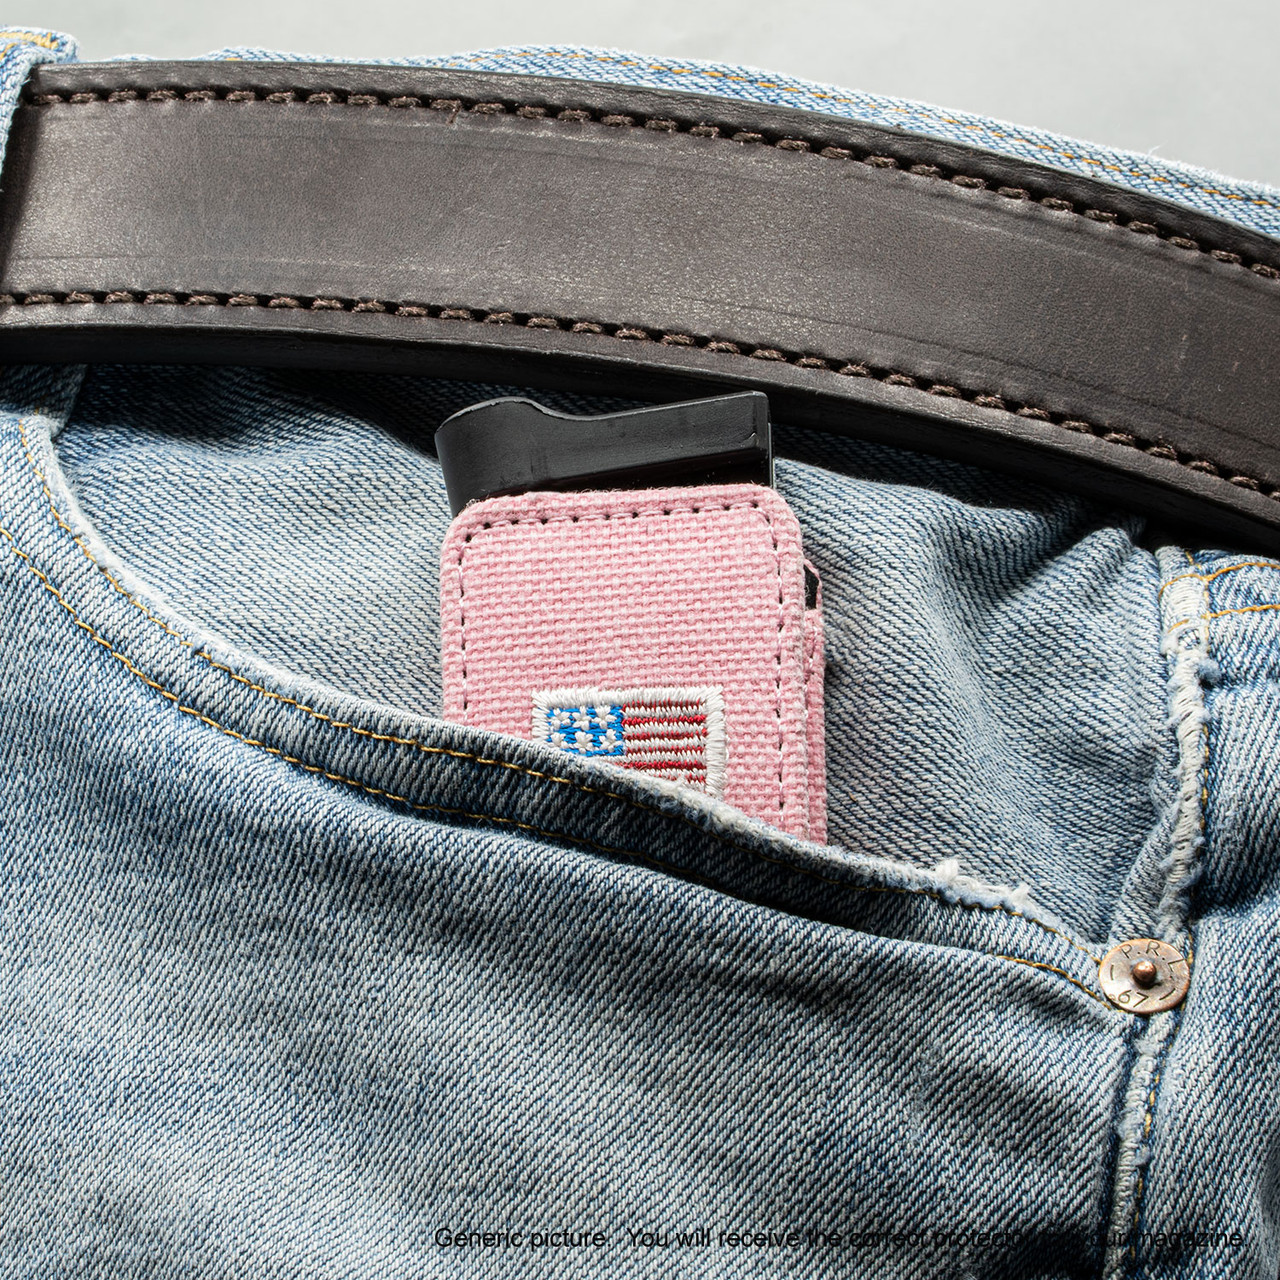 Taurus G2C Pink Canvas Flag Magazine Pocket Protector